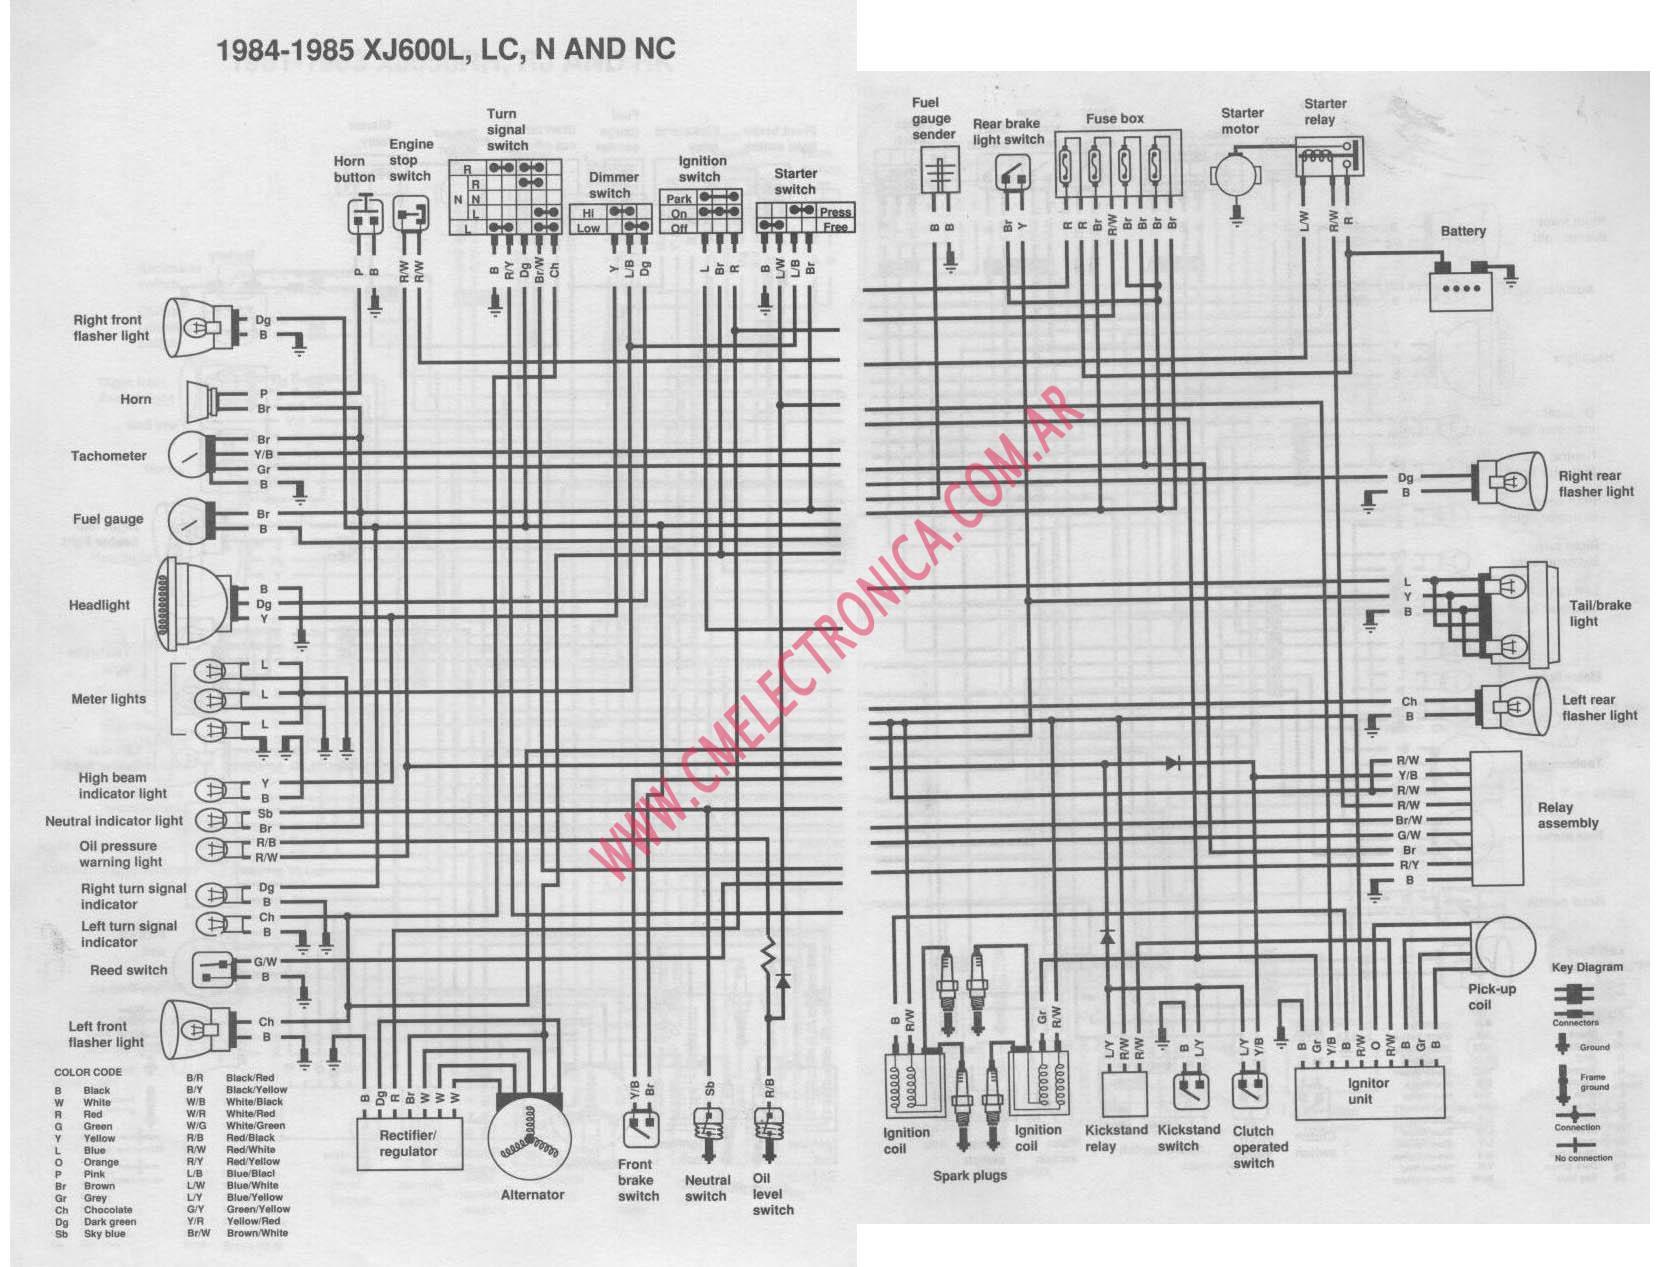 Raptor 660 Fuse Box Armature Wiring Diagram – Honda Gx670 24 Hp Wiring Diagram